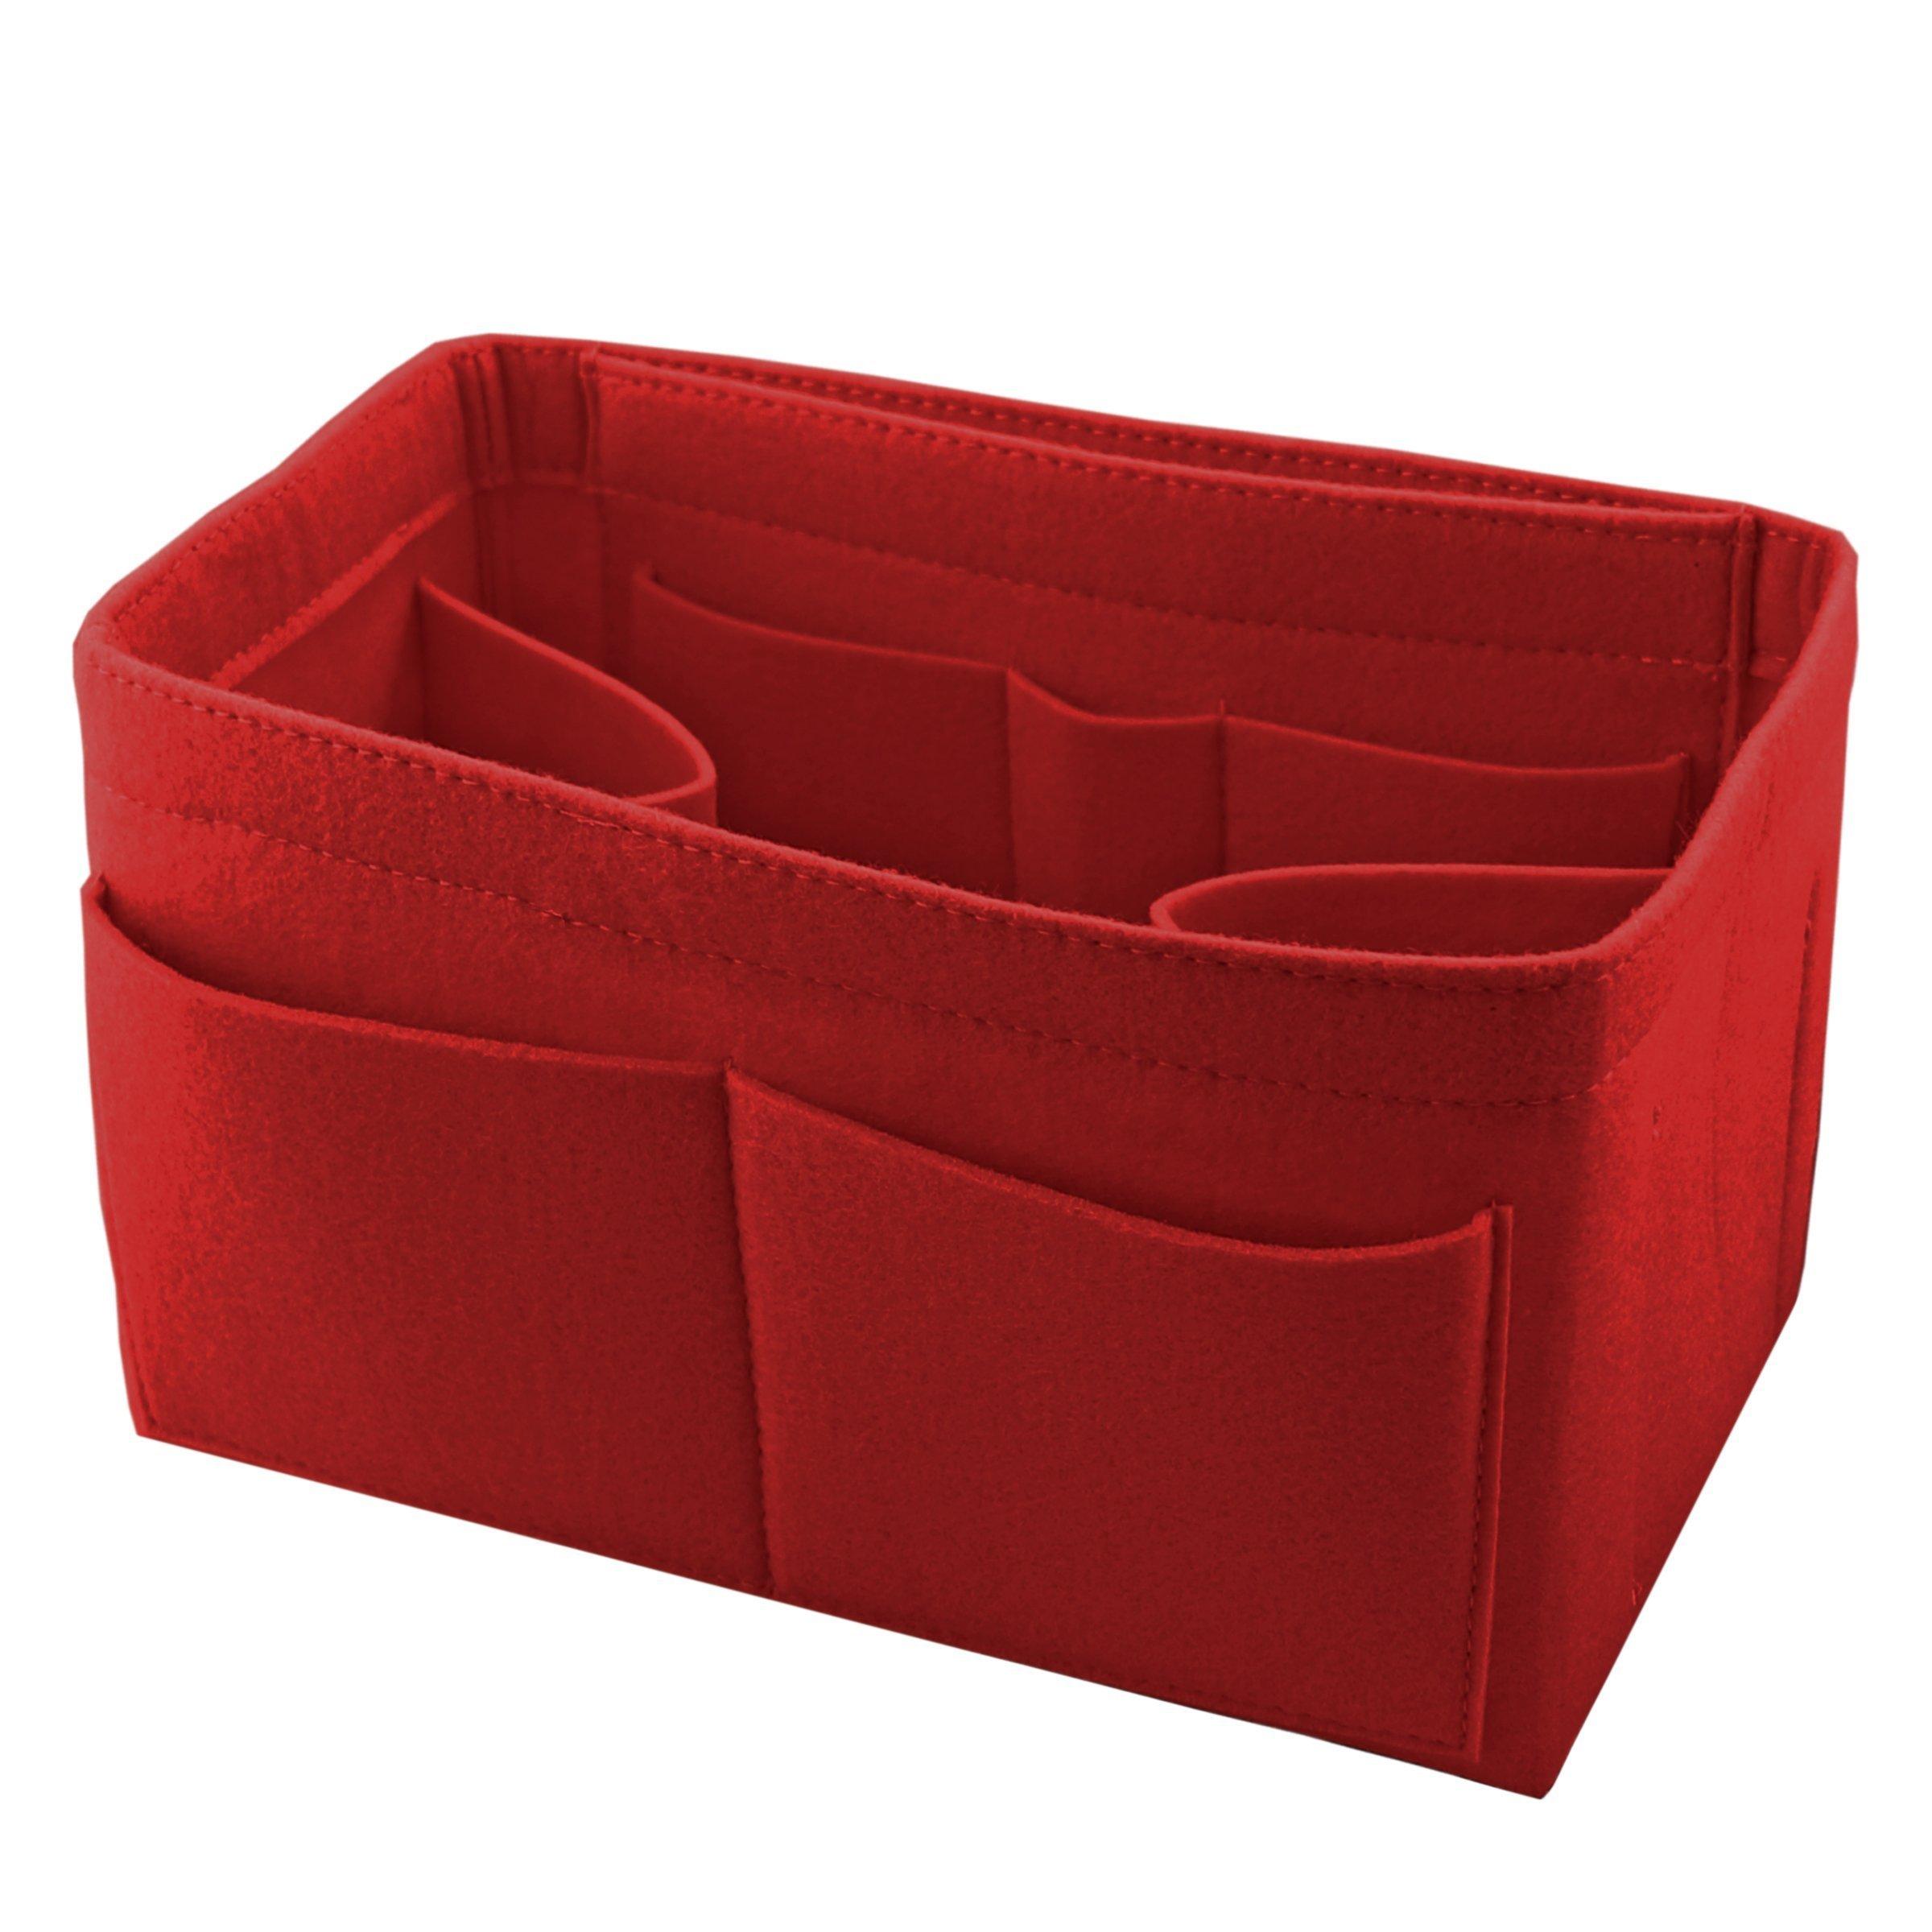 2mm Felt Fabric Handbag Purse Insert Organizer Bag 10 Pockets Bag in Bag Super light weight (Large, Red)